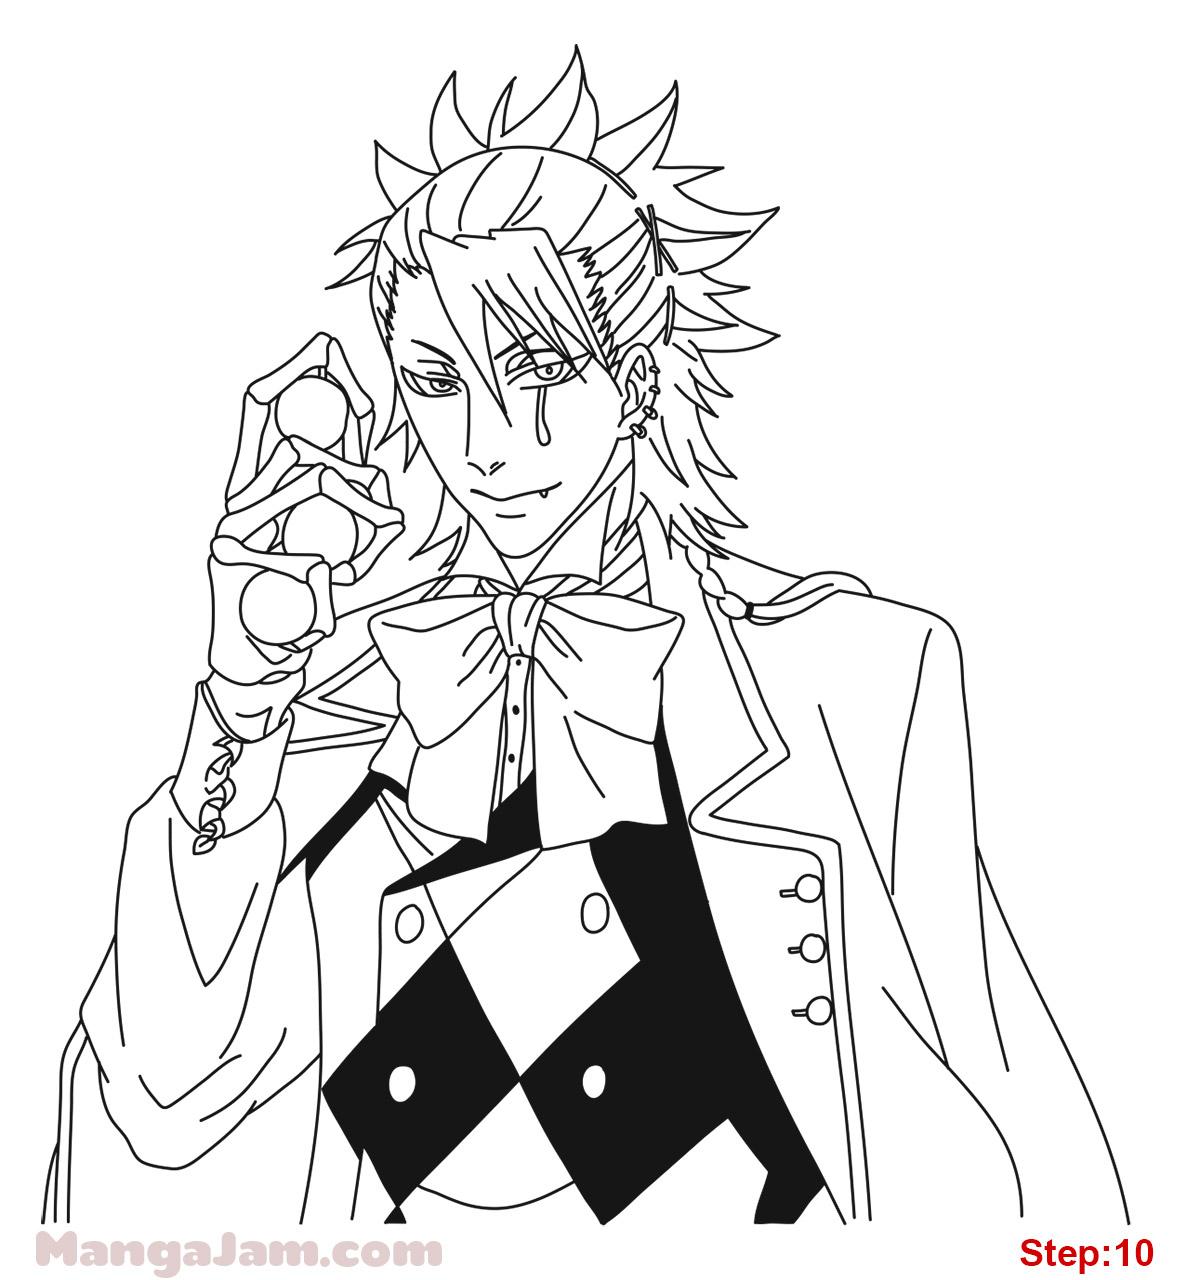 1187x1280 How To Draw Joker From Kuroshitsuji